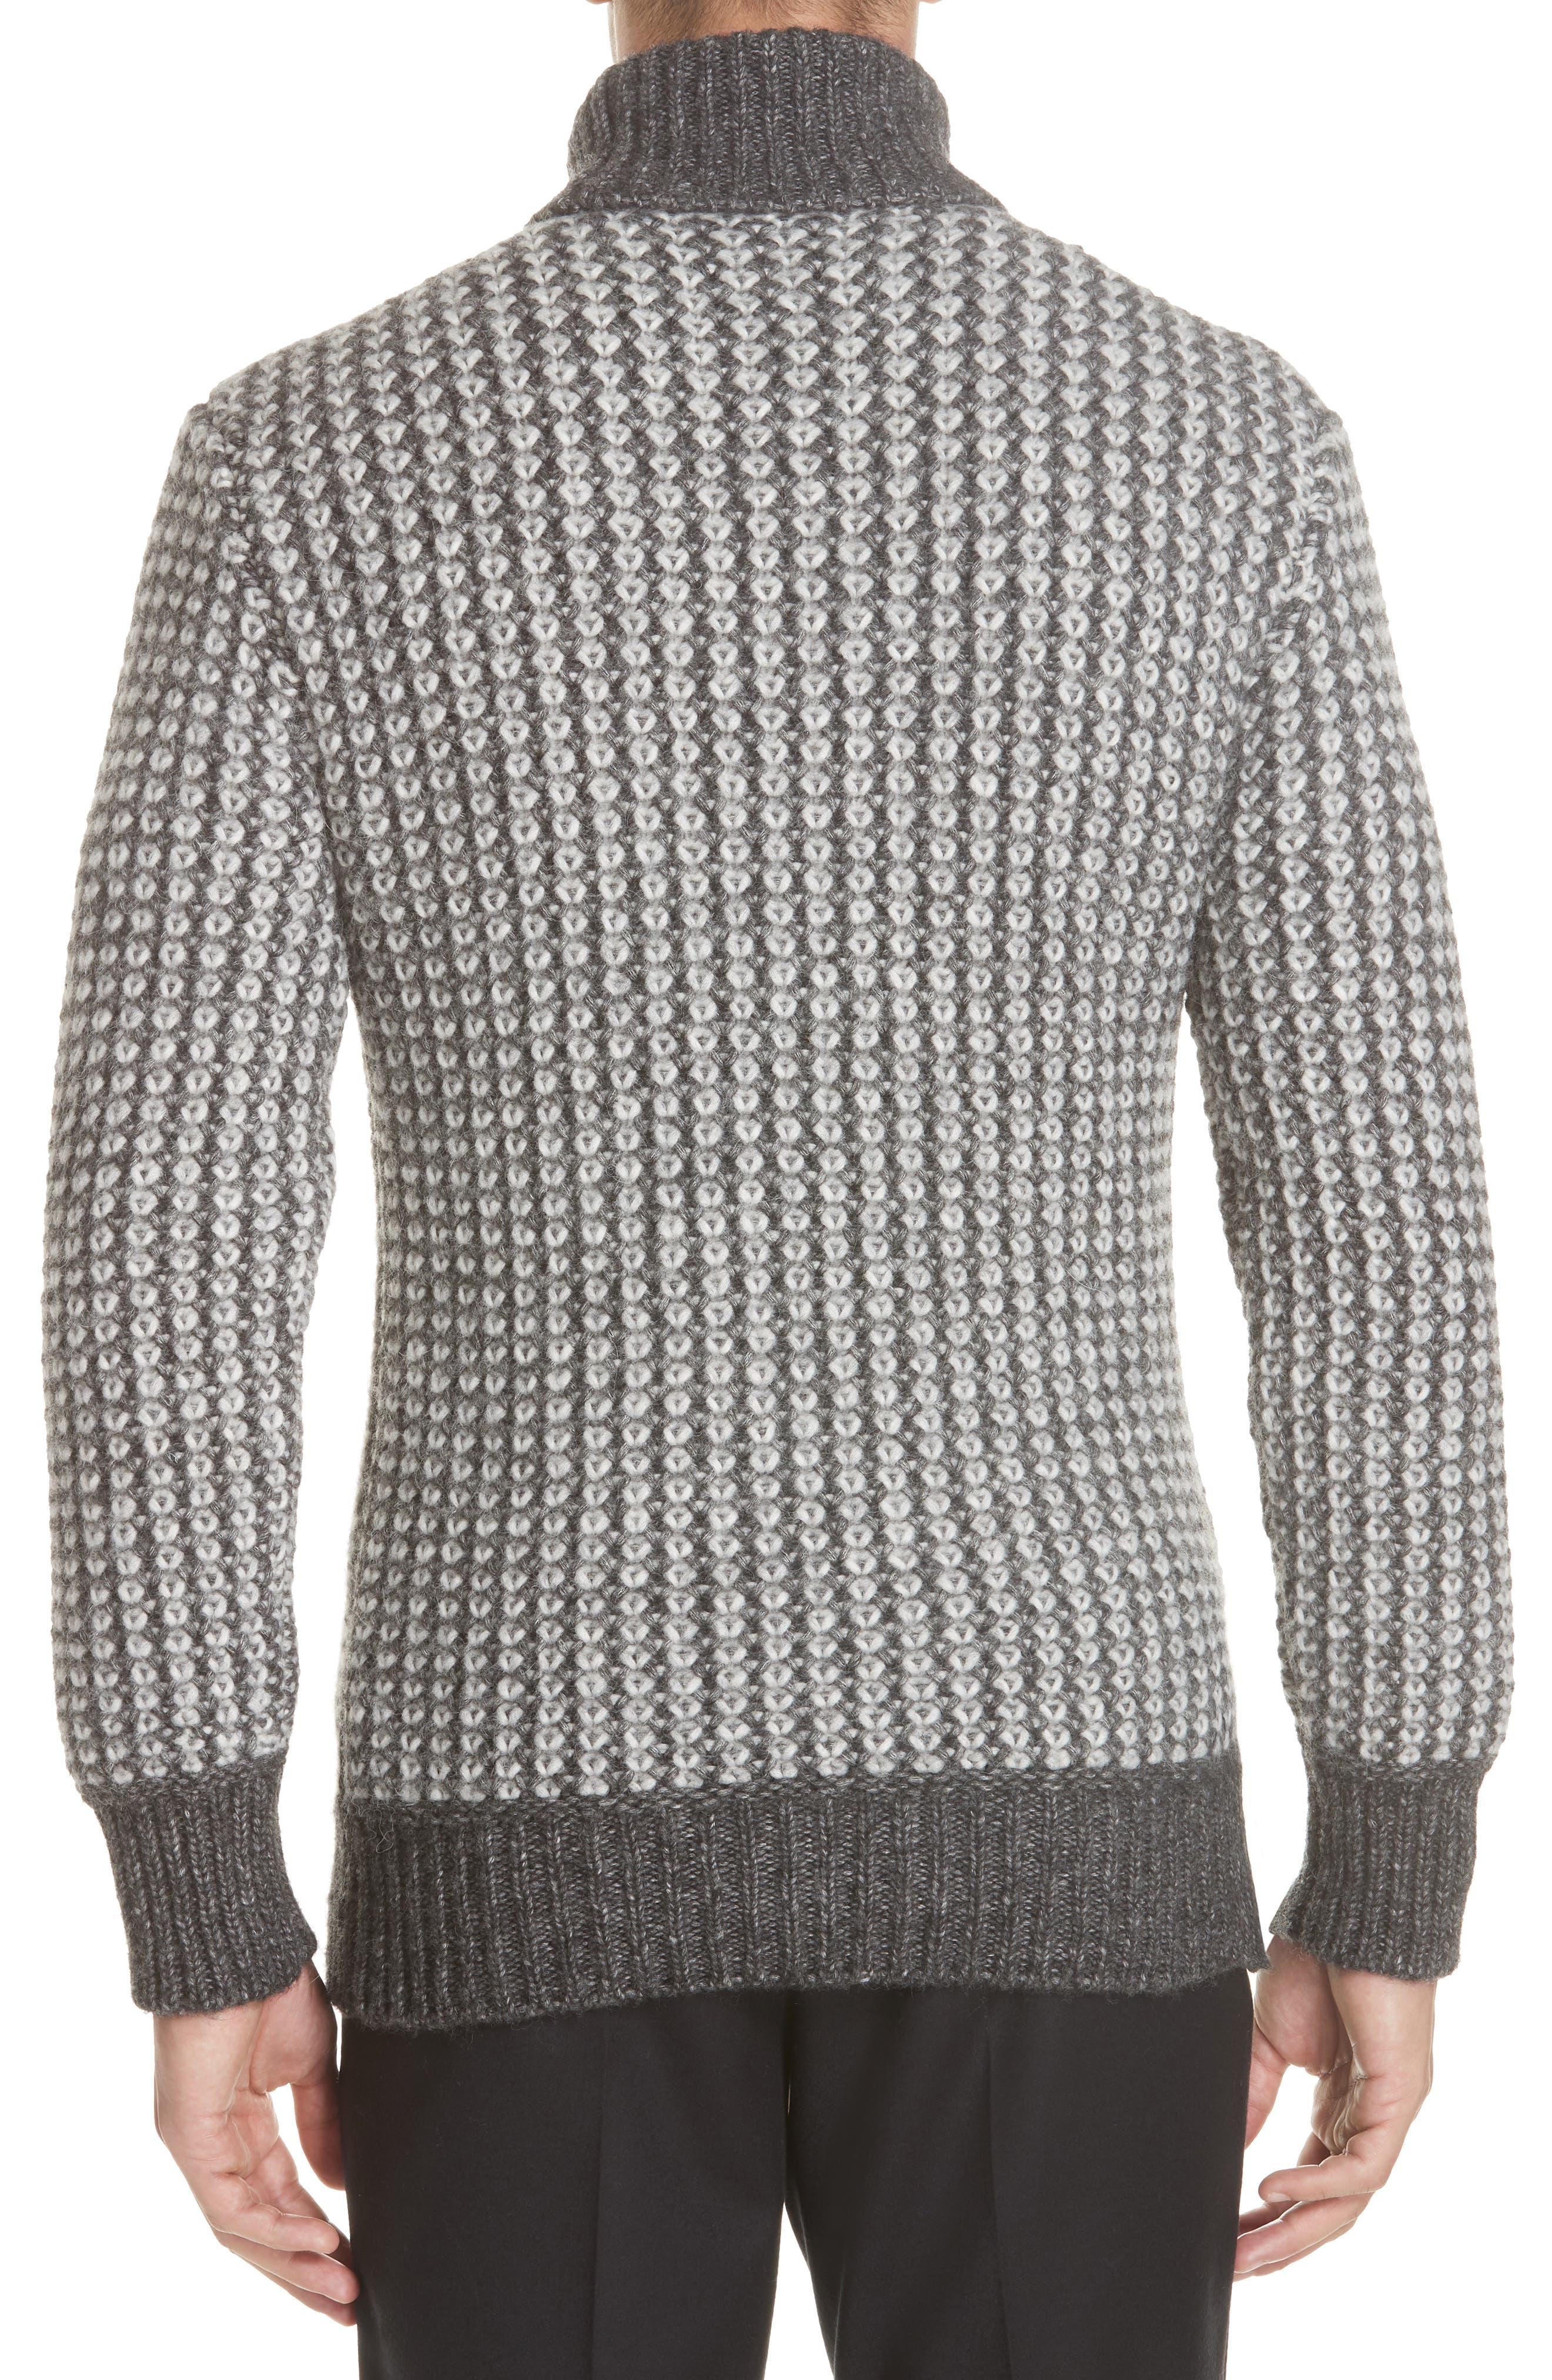 Cotton Blend Turtleneck Sweater,                             Alternate thumbnail 2, color,                             GREY